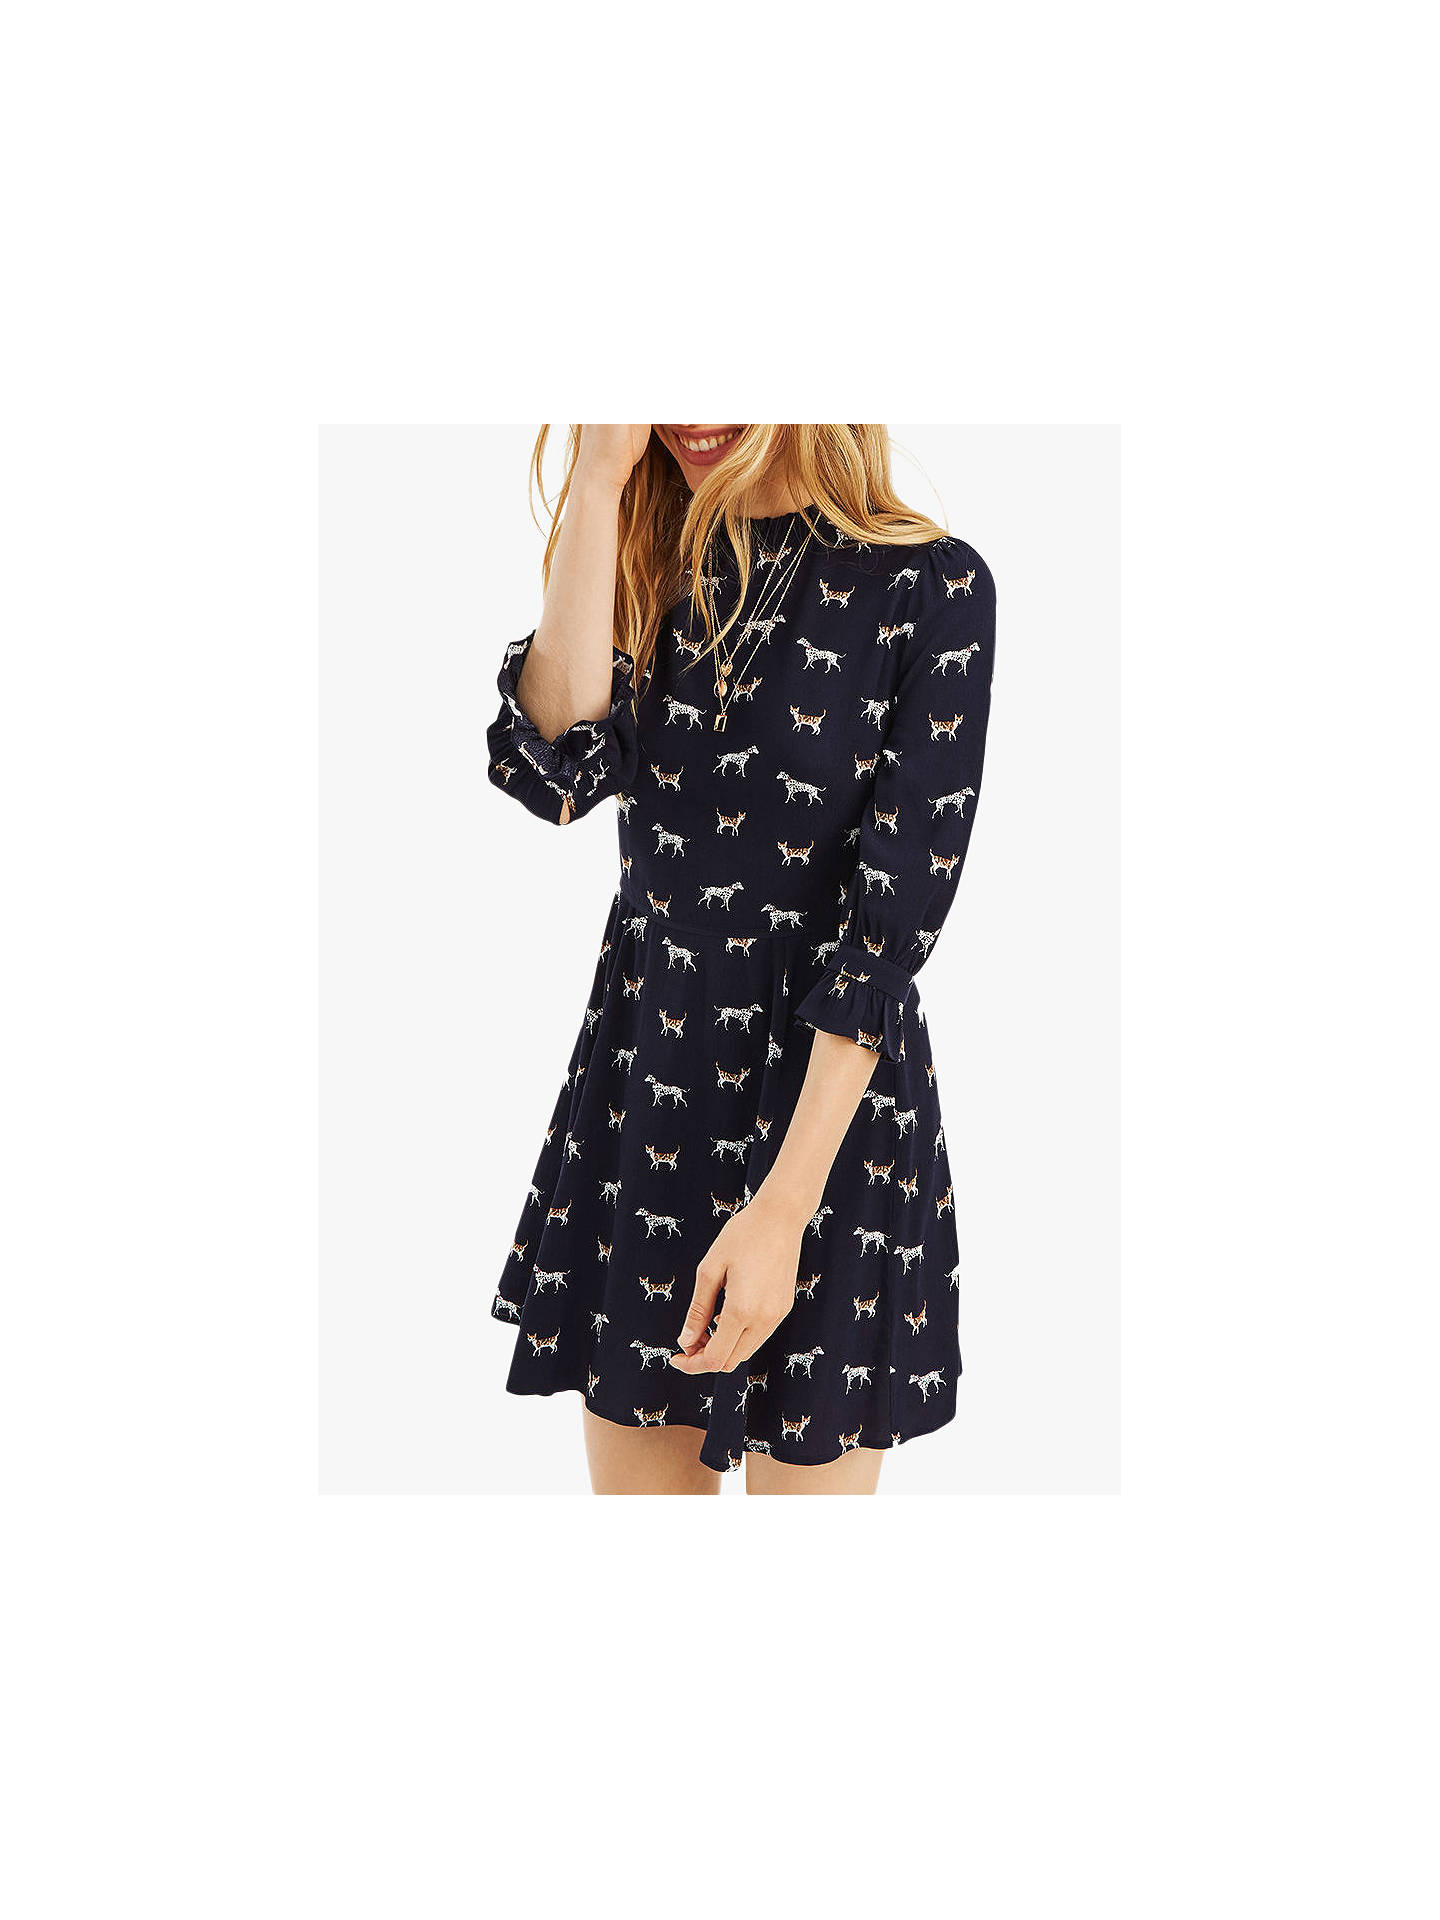 BuyOasis Cats and Dogs Skater Dress 2e3e1b9e7